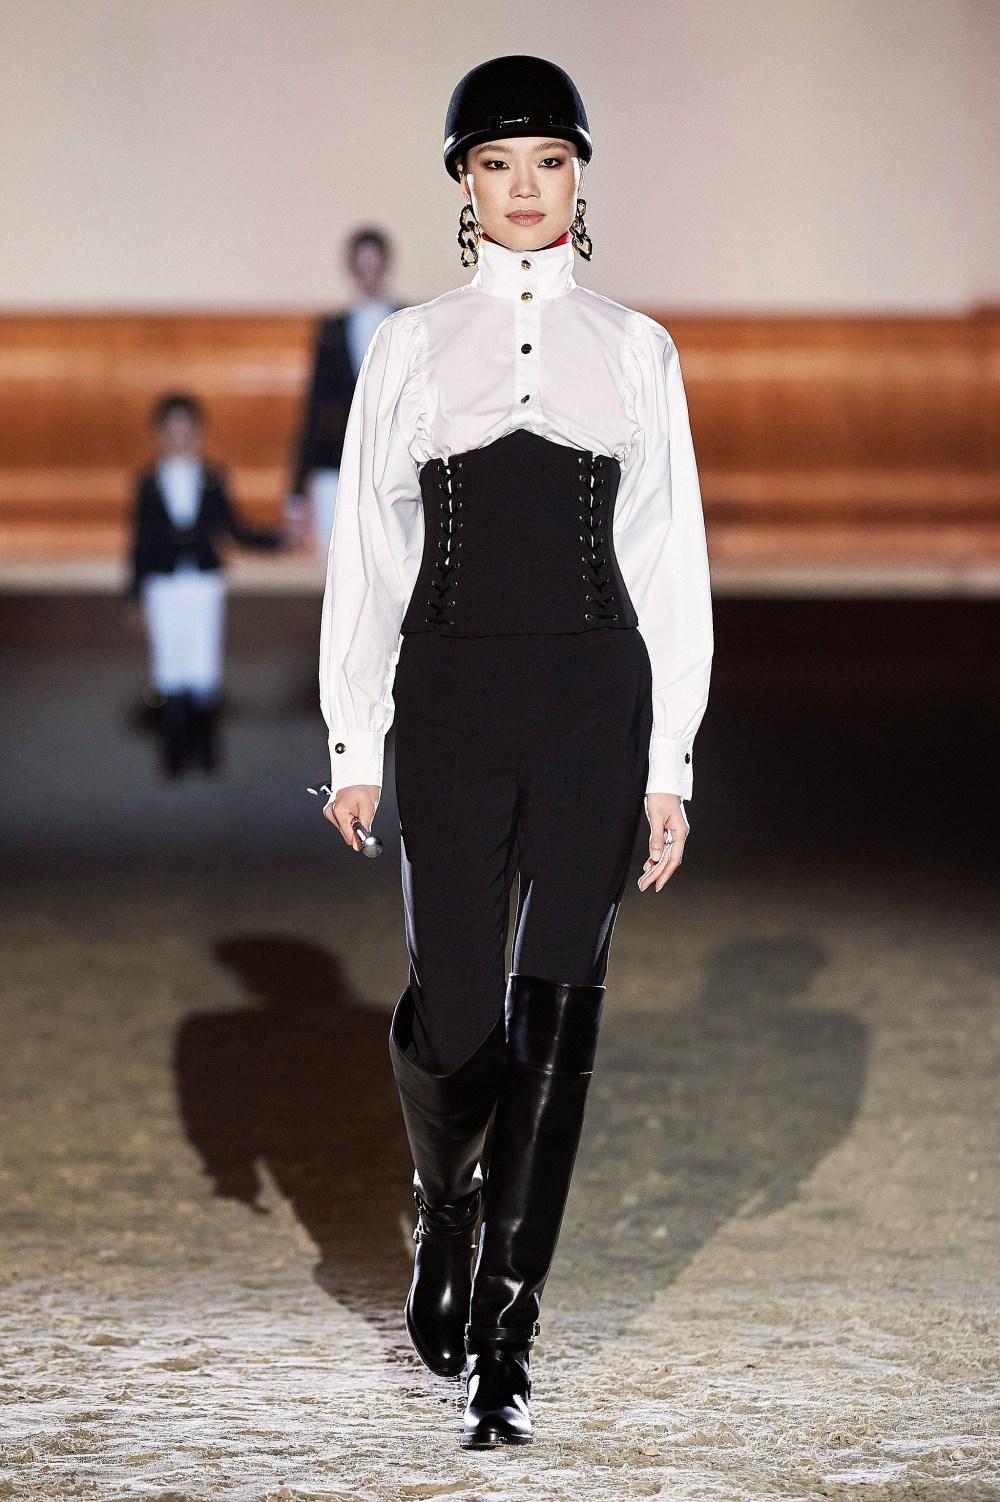 Elisabetta Franchi: Elisabetta Franchi Fall Winter 2021-22 Fashion Show Photo #39